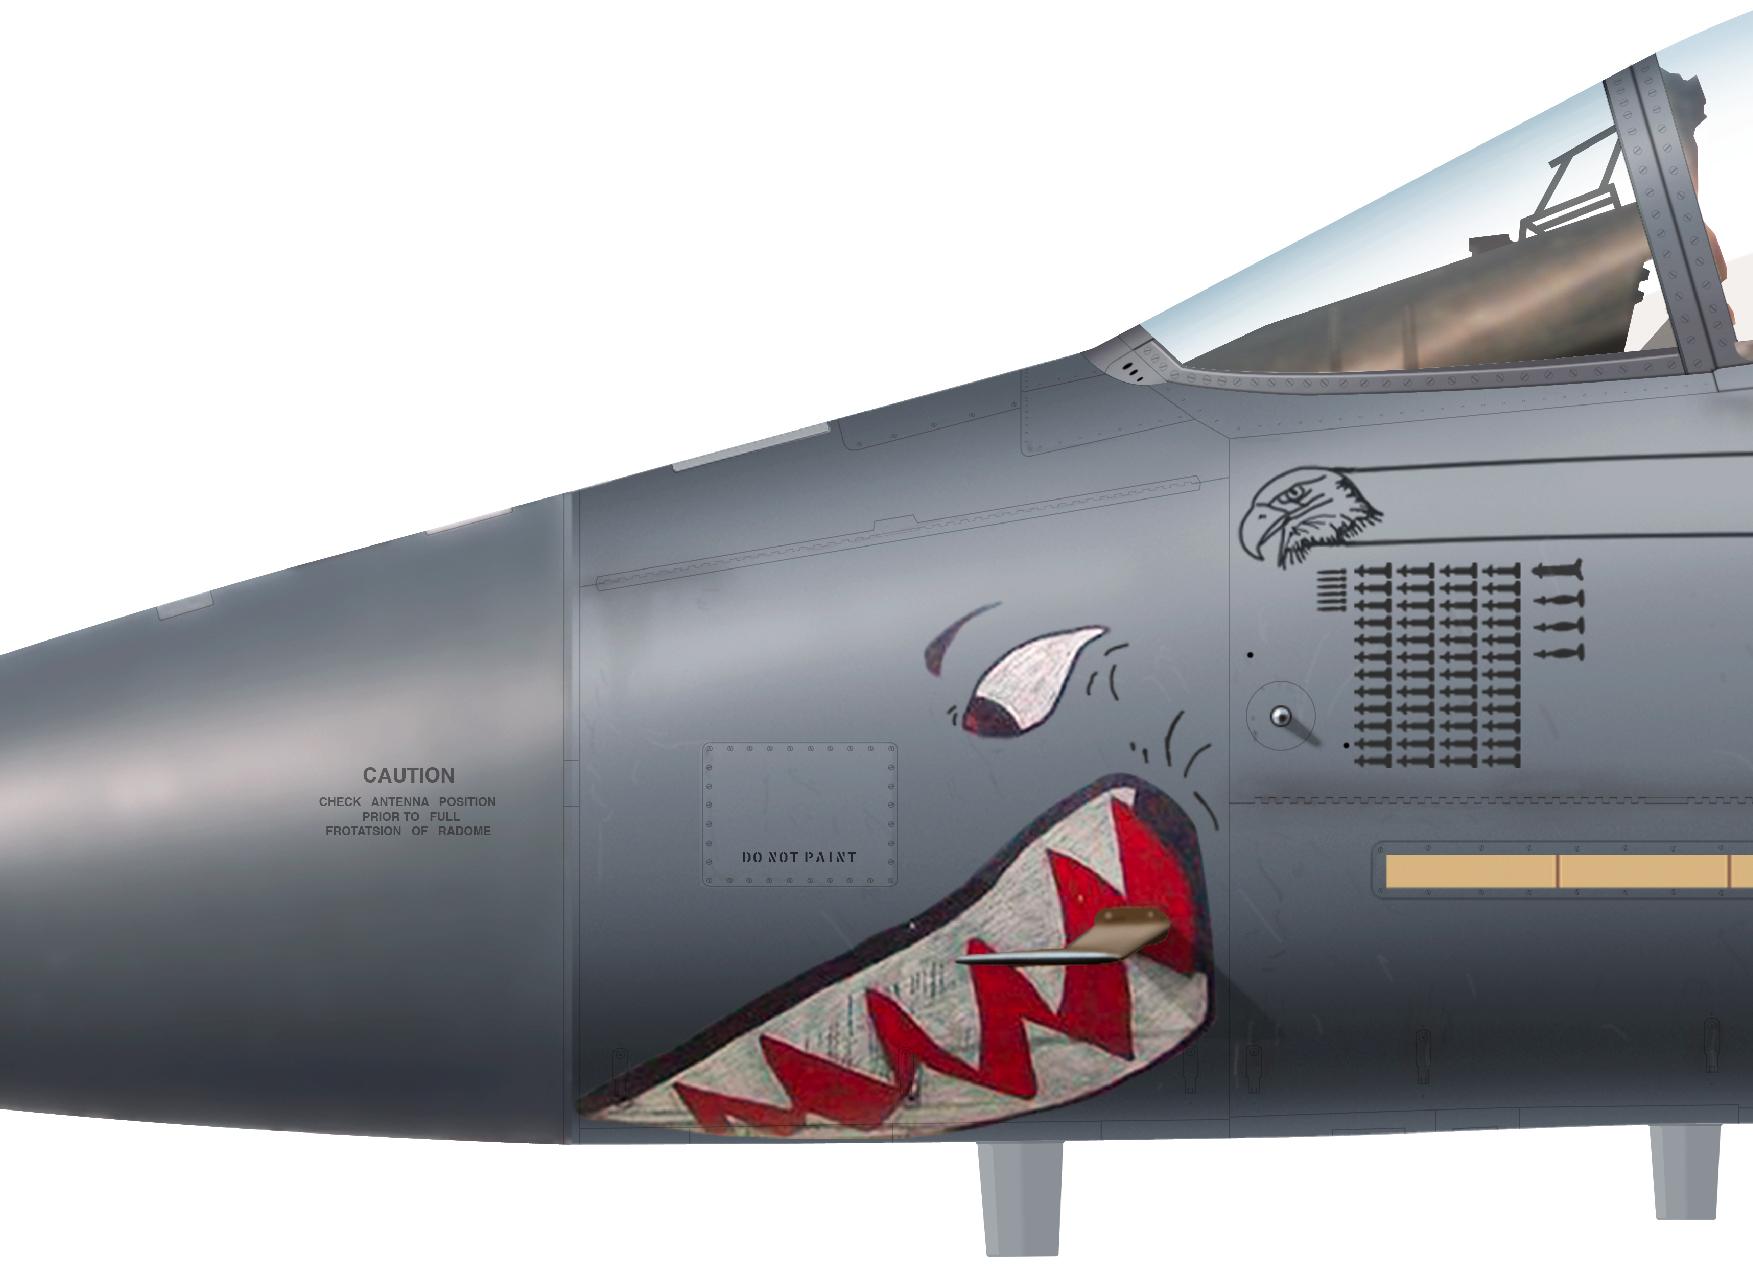 15. F-15E Strike Eagle 'Sharkmouth' s/n 87-0173 MO 391st FS, 366th Wg